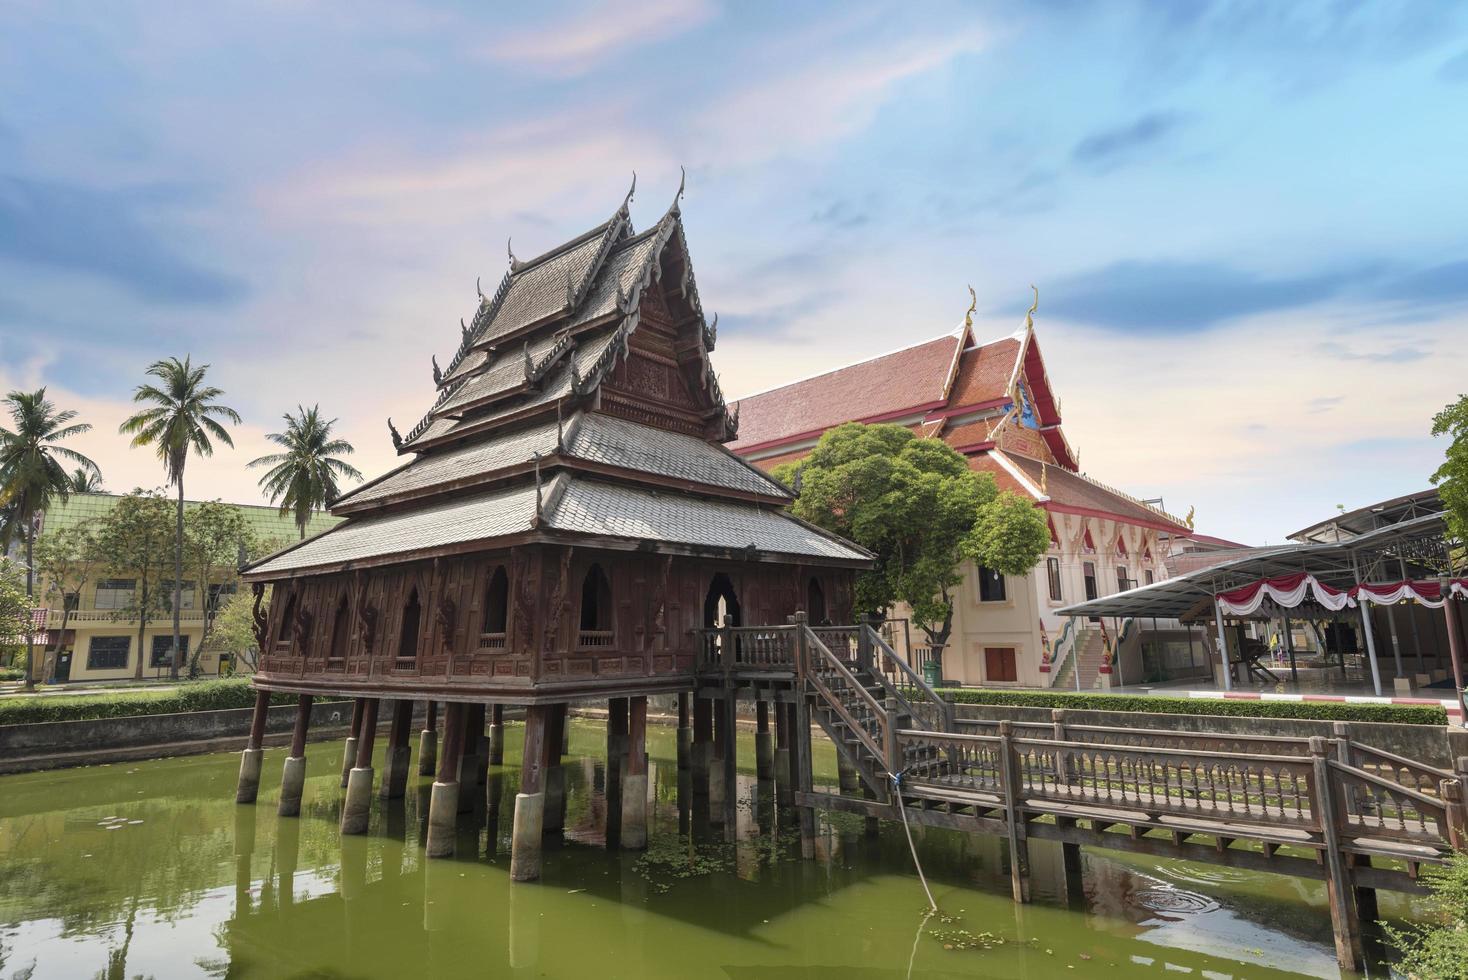 traditionell trächedi i Thailand foto